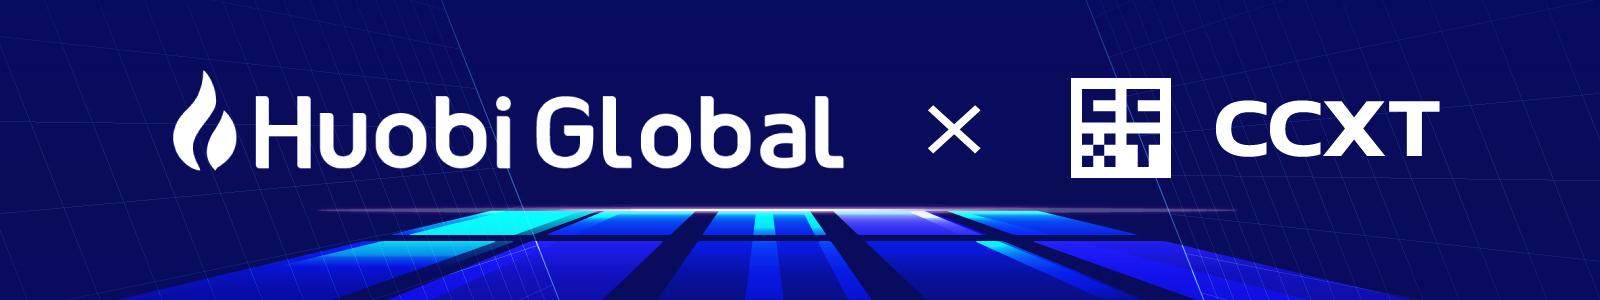 Huobi Global – Bitcoin and Cryptocurrency Exchange